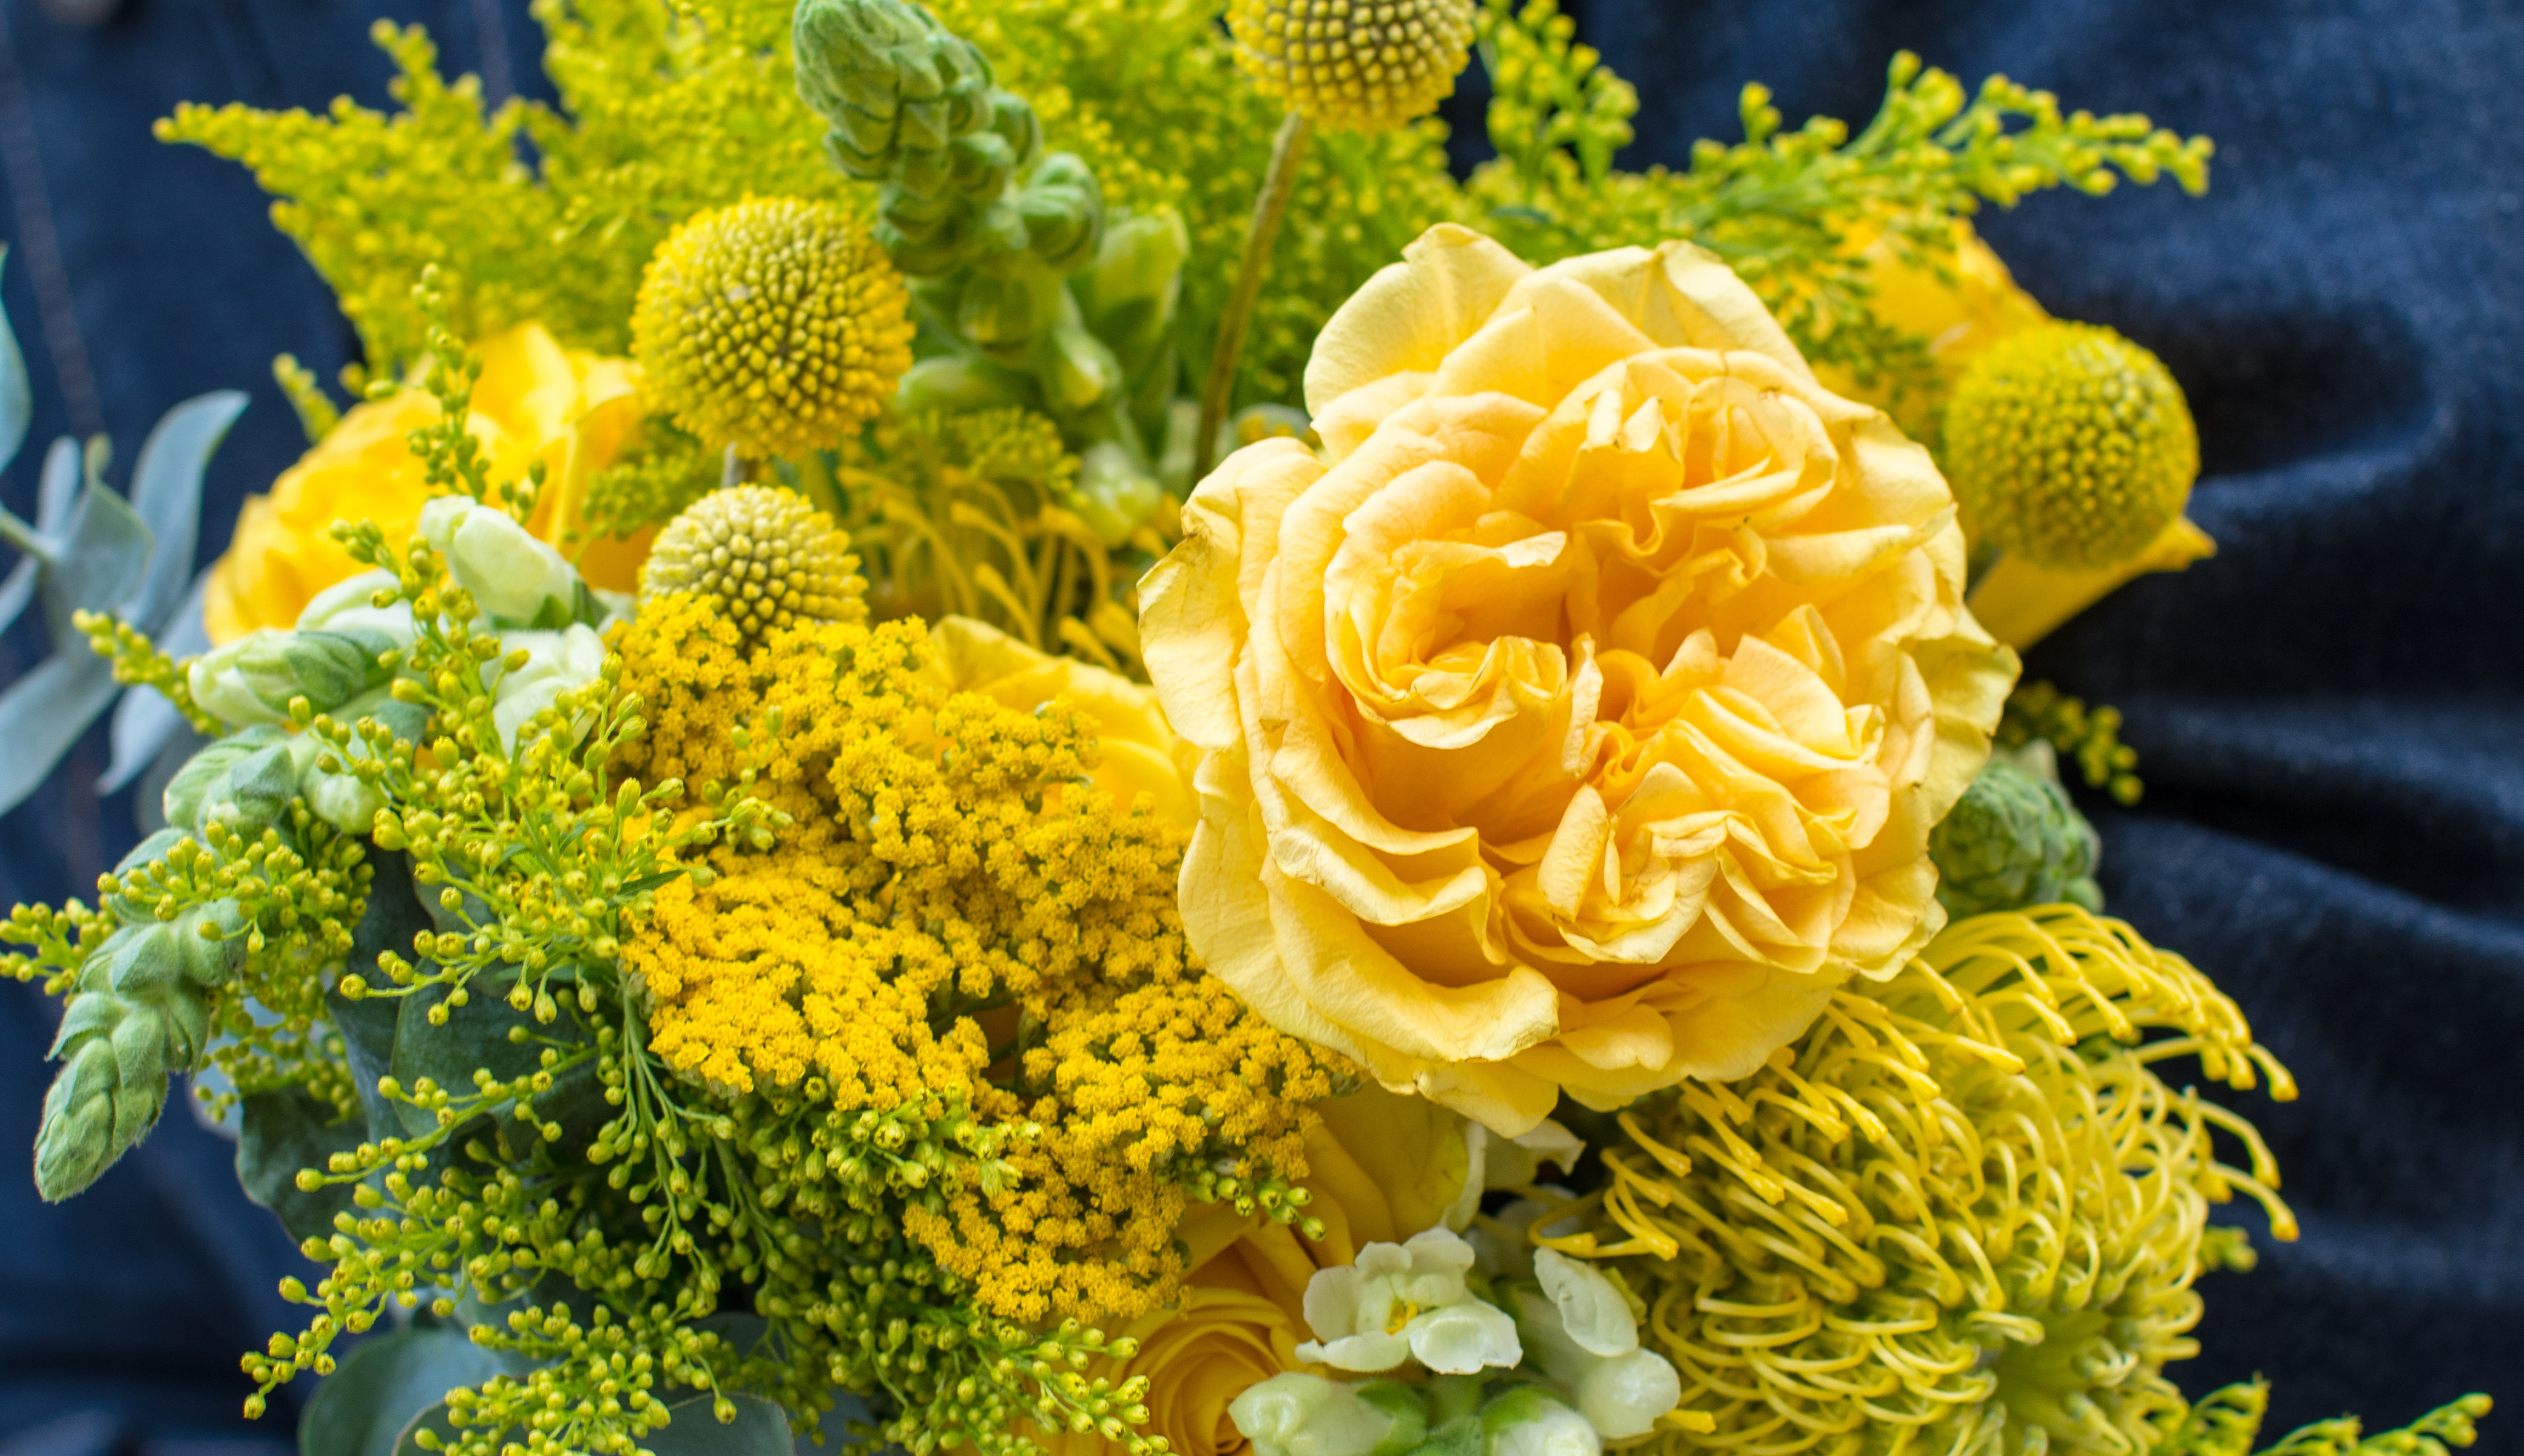 Close up shot of yellow flower bouquet